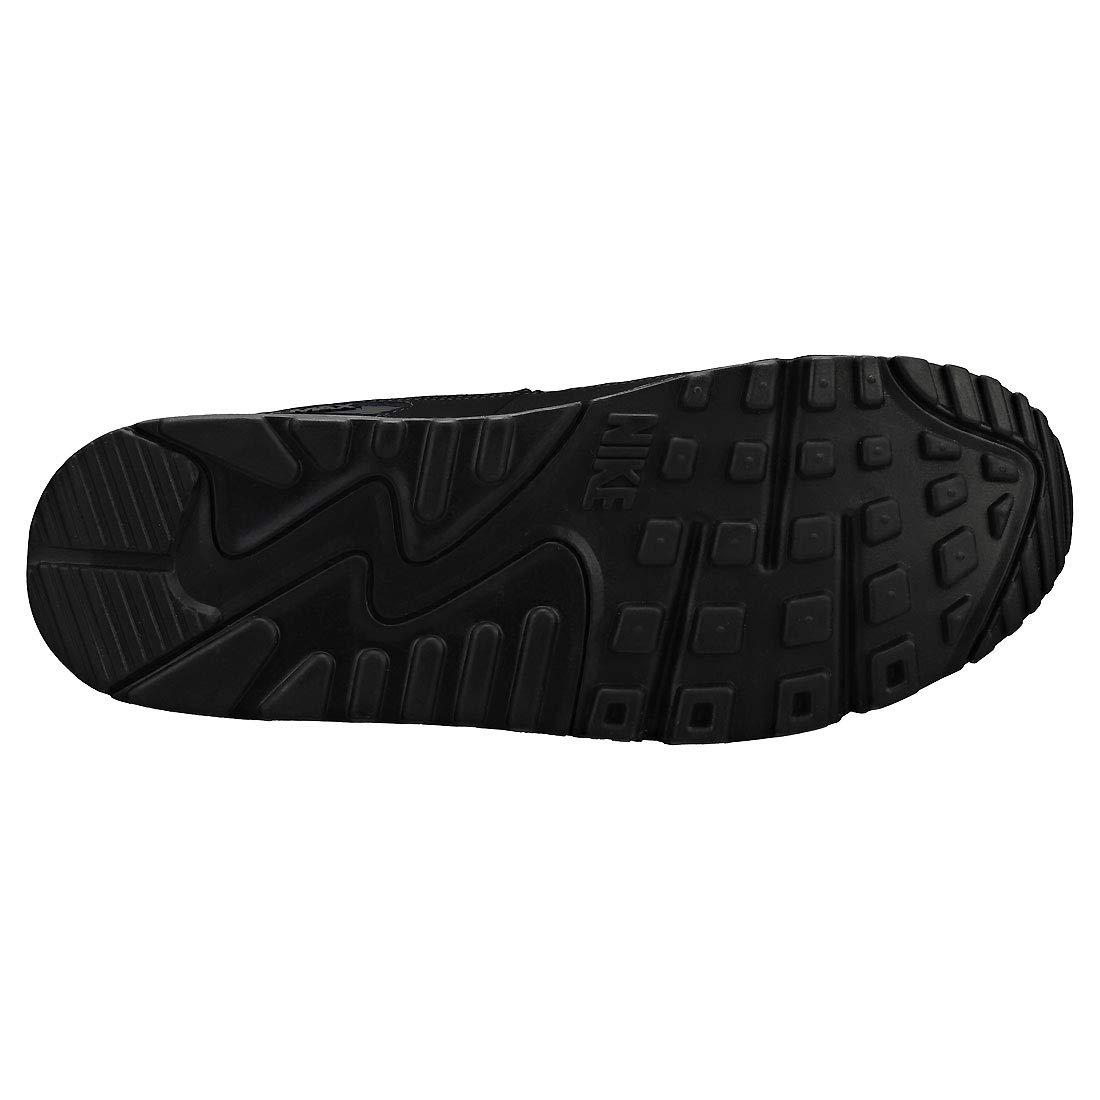 Nike Herren Air Air Air Max 90 Essential Fitnessschuhe B07HYPQZKK Turnschuhe Hervorragende Eigenschaften 1ea064